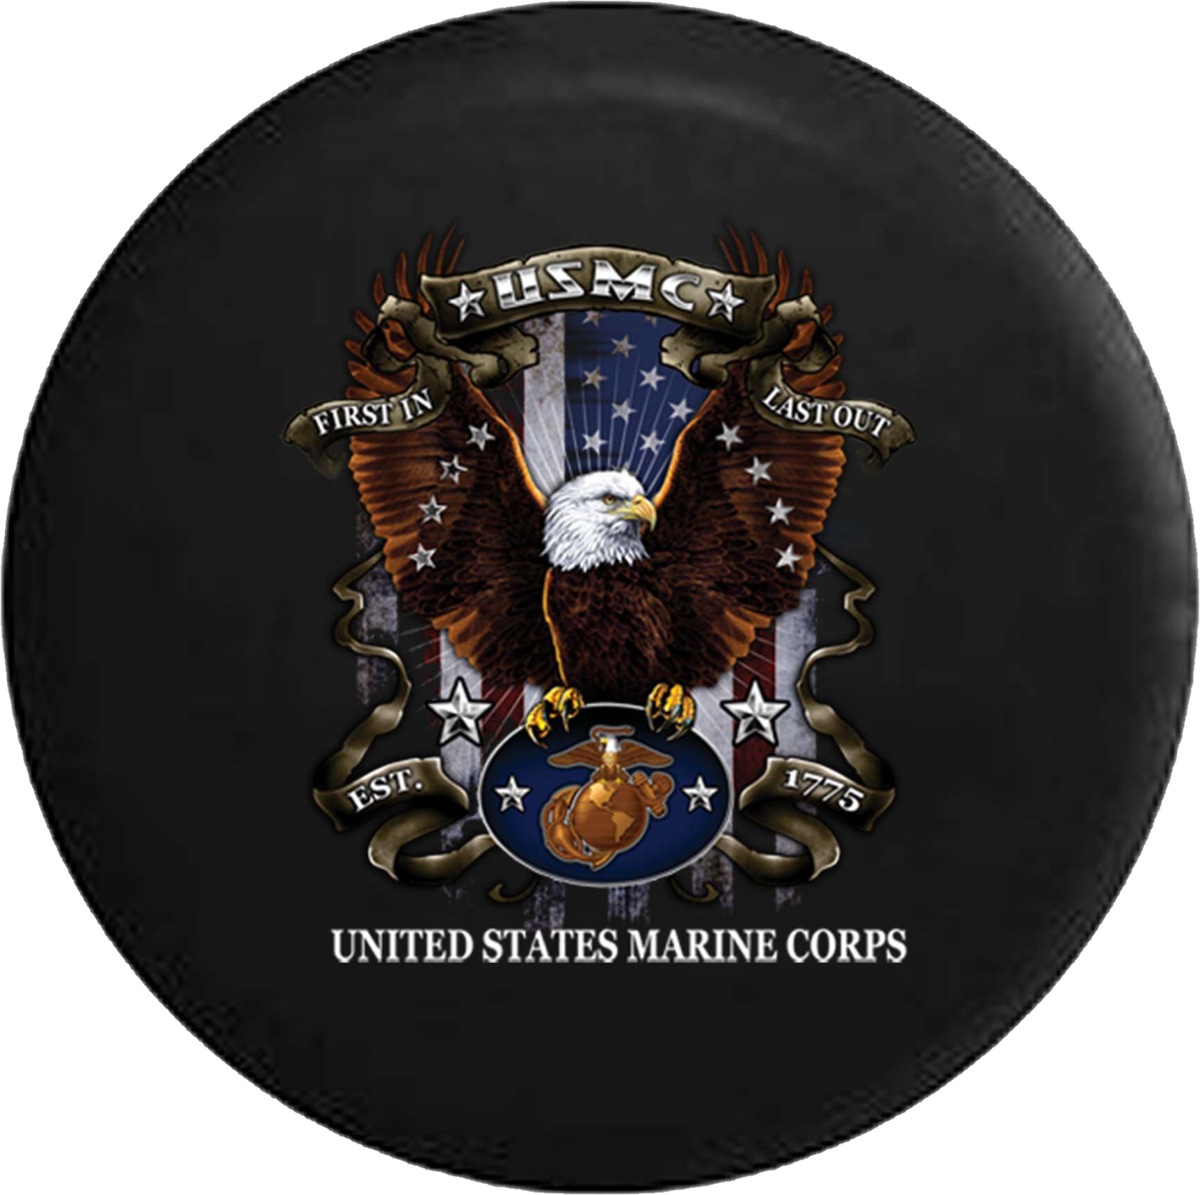 Tire Cover Pro Usmc United States Marine Corps Military American